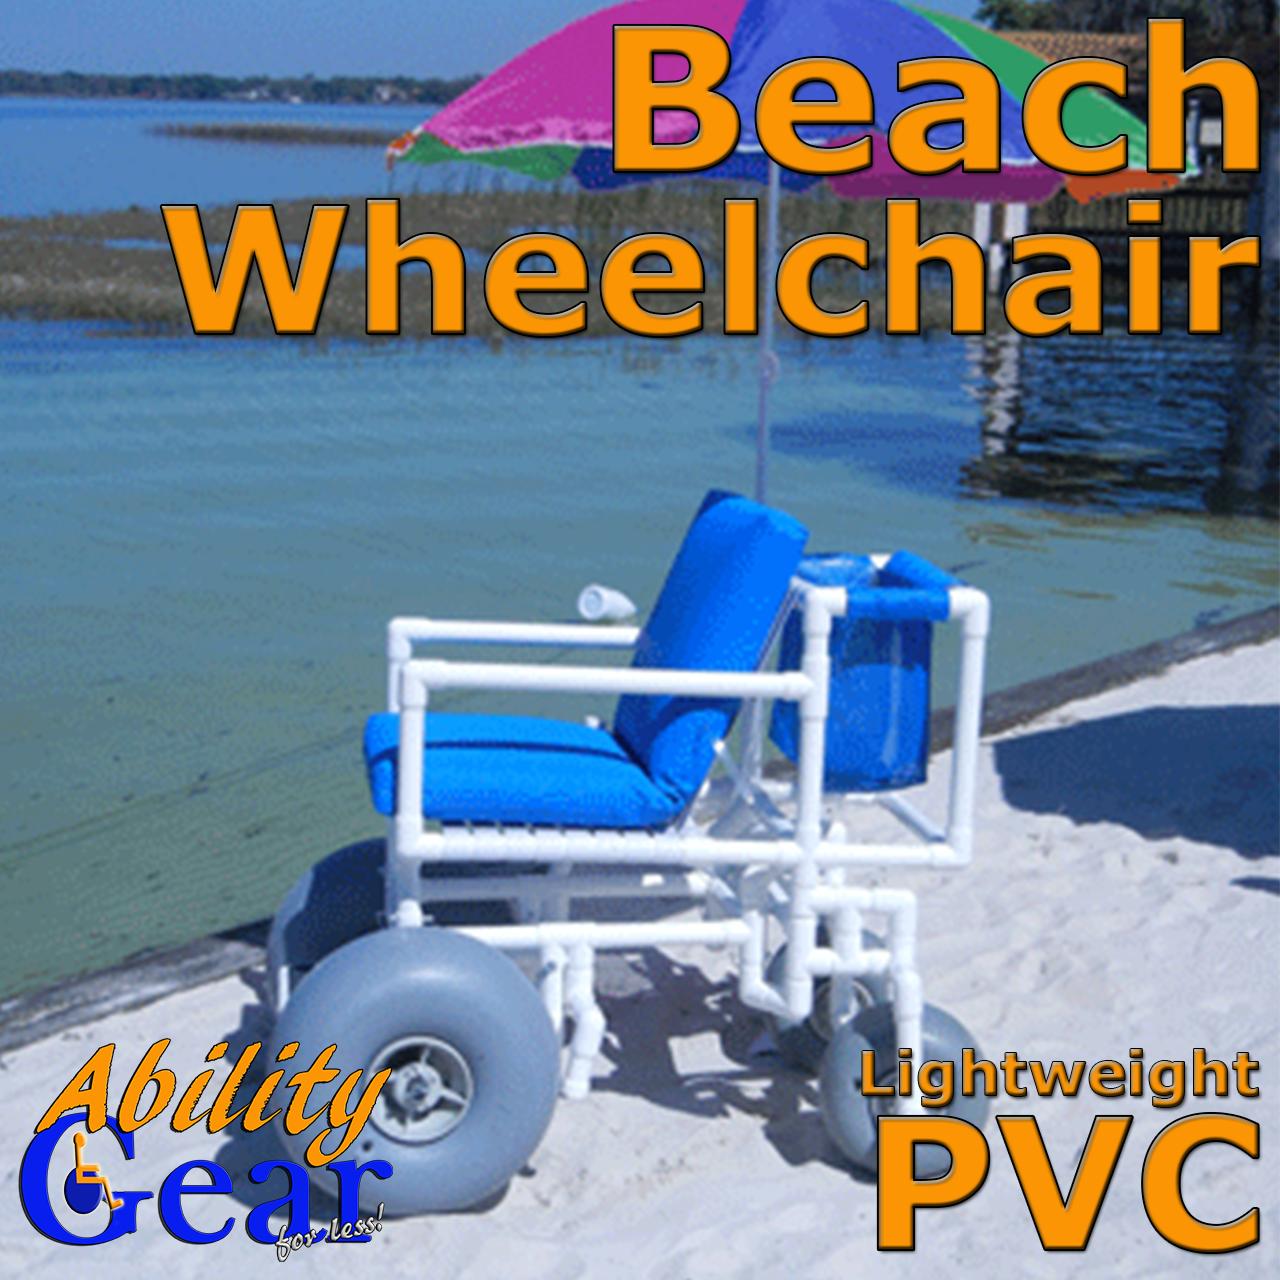 Ability Gear For Less - Beach Wheelchair PVC Style with Rear Pivot Wheels, $1,088.88 (http://www.abilitygearforless.com/beach-wheelchair-pvc-style-with-rear-pivot-wheels/)